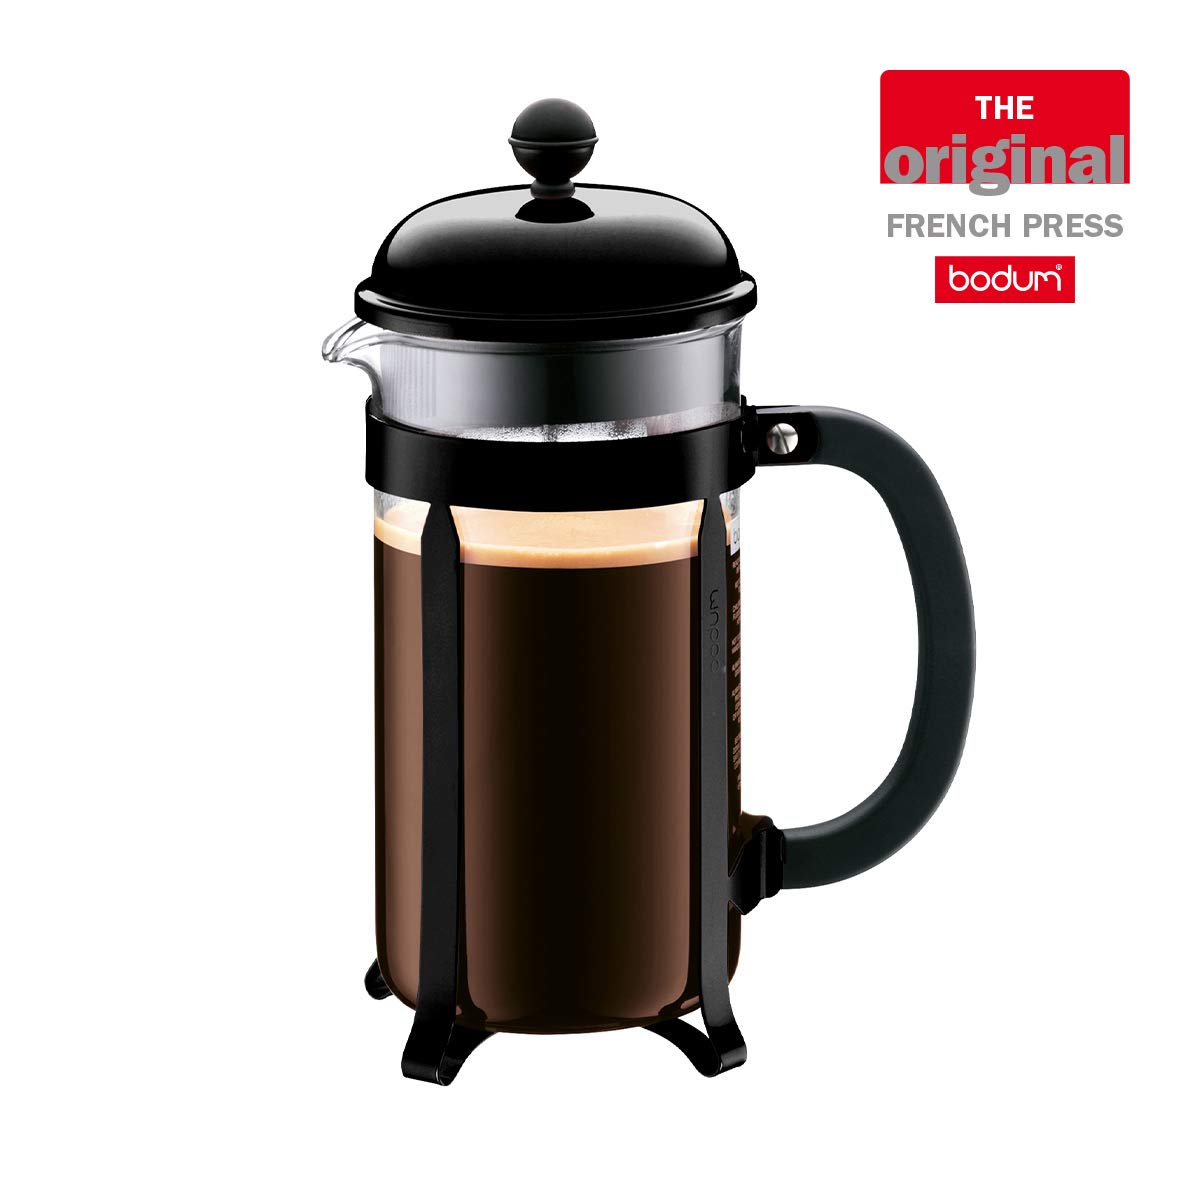 BODUM 1928-01 Chambord French Press Coffee